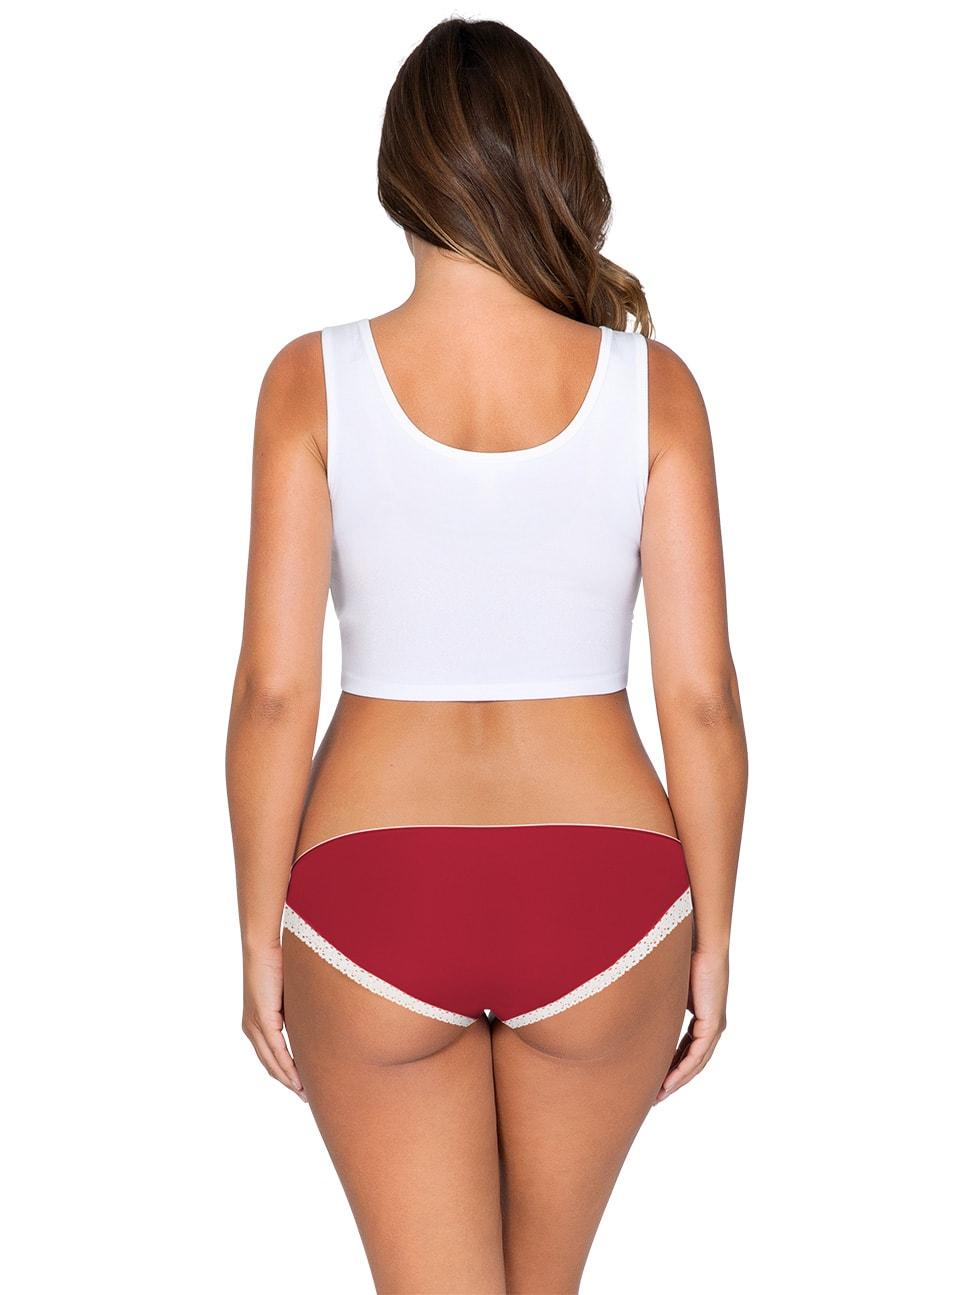 ParfaitPantyBikini PP301 D TangoRedBack - So Lovely Bikini Tango Red PP301